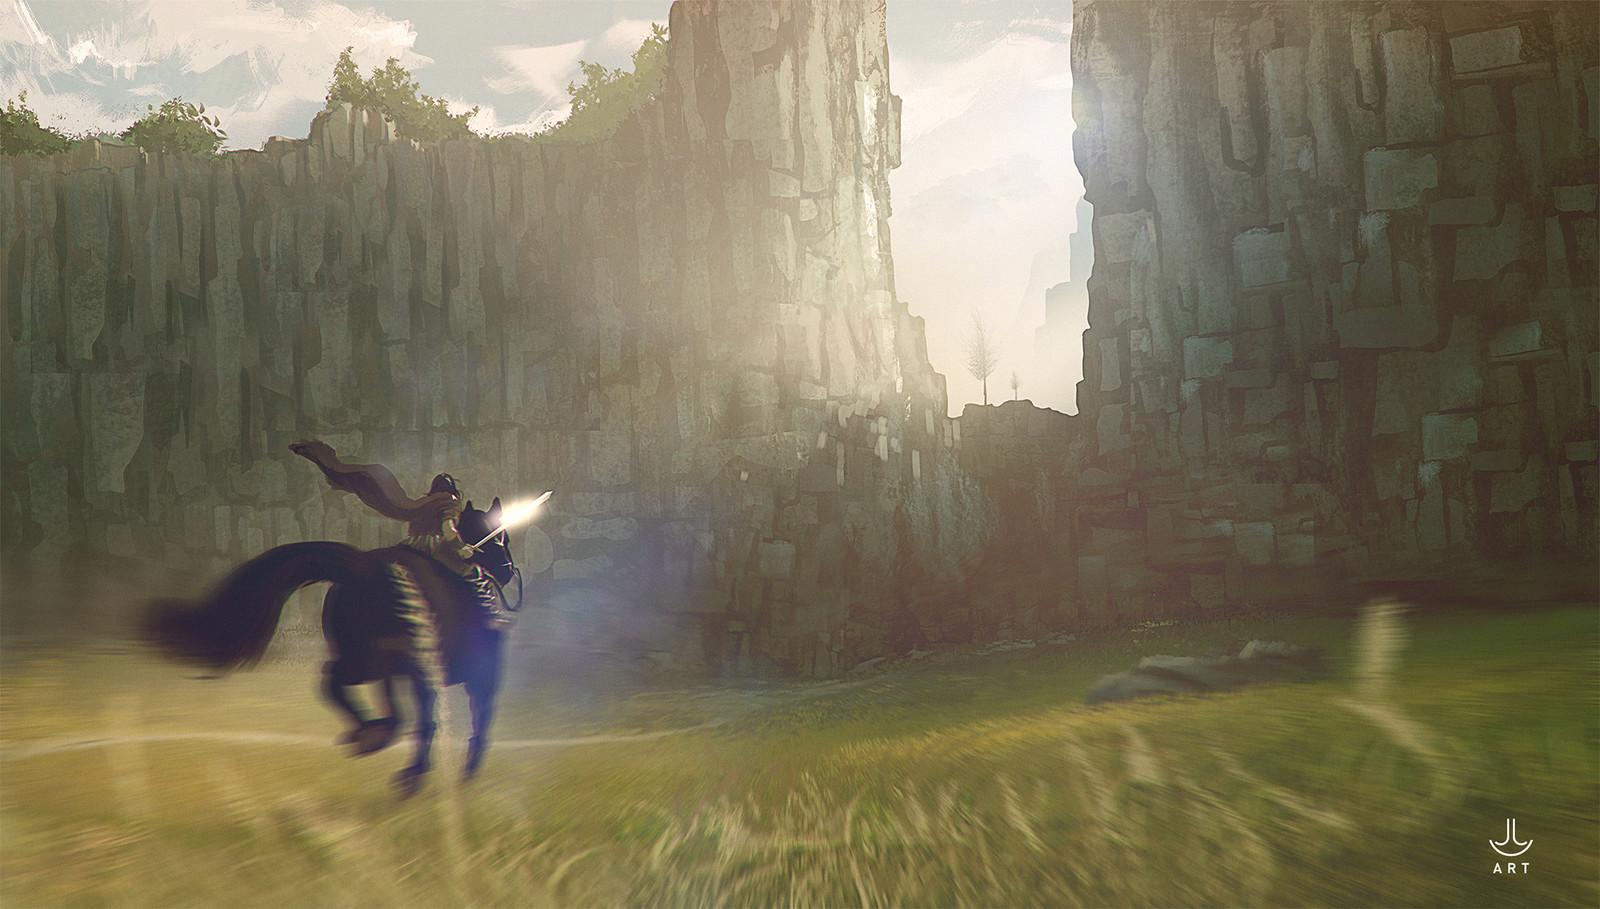 Wander's quest